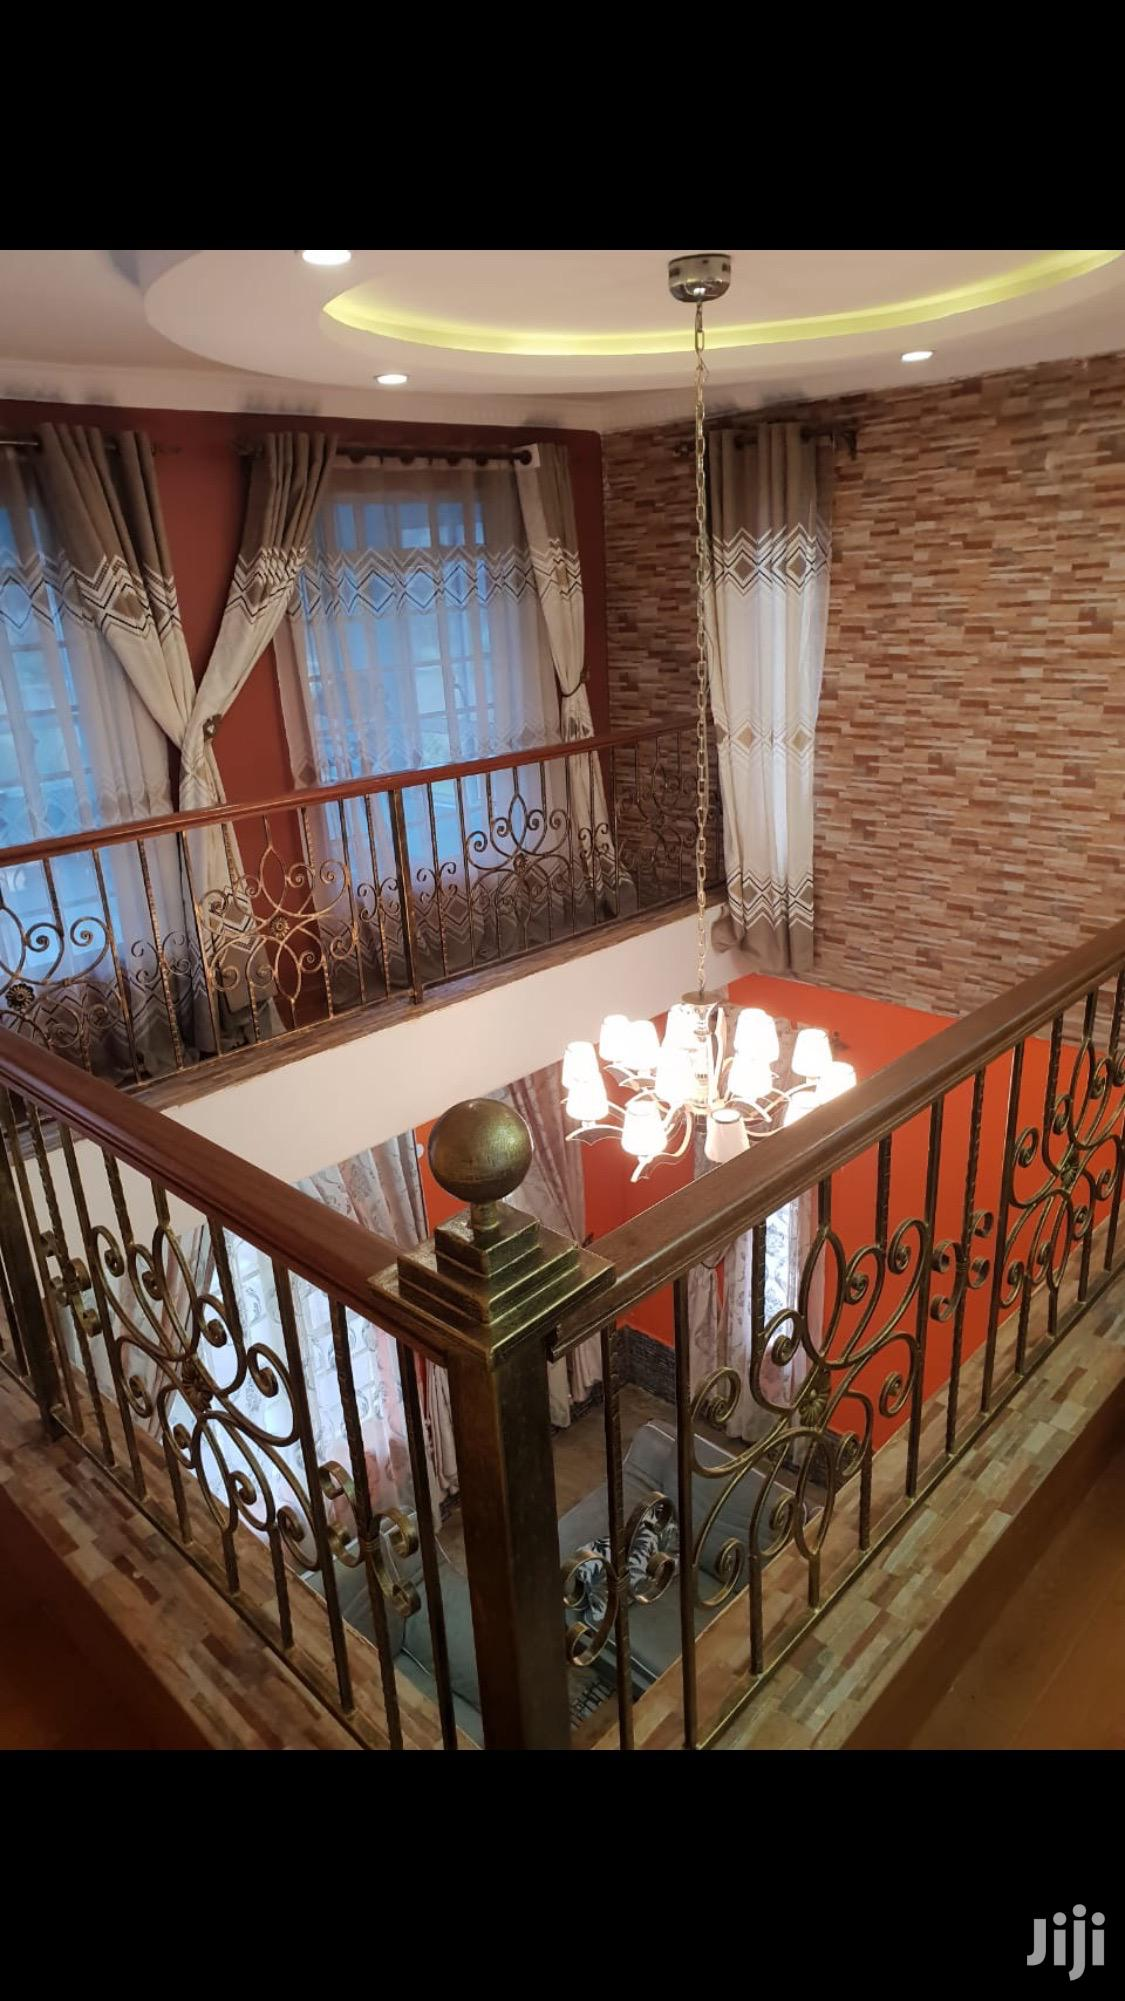 5/Five Bedroom Maisonette In Ruiru-membley | Houses & Apartments For Sale for sale in Ruiru, Kiambu, Kenya